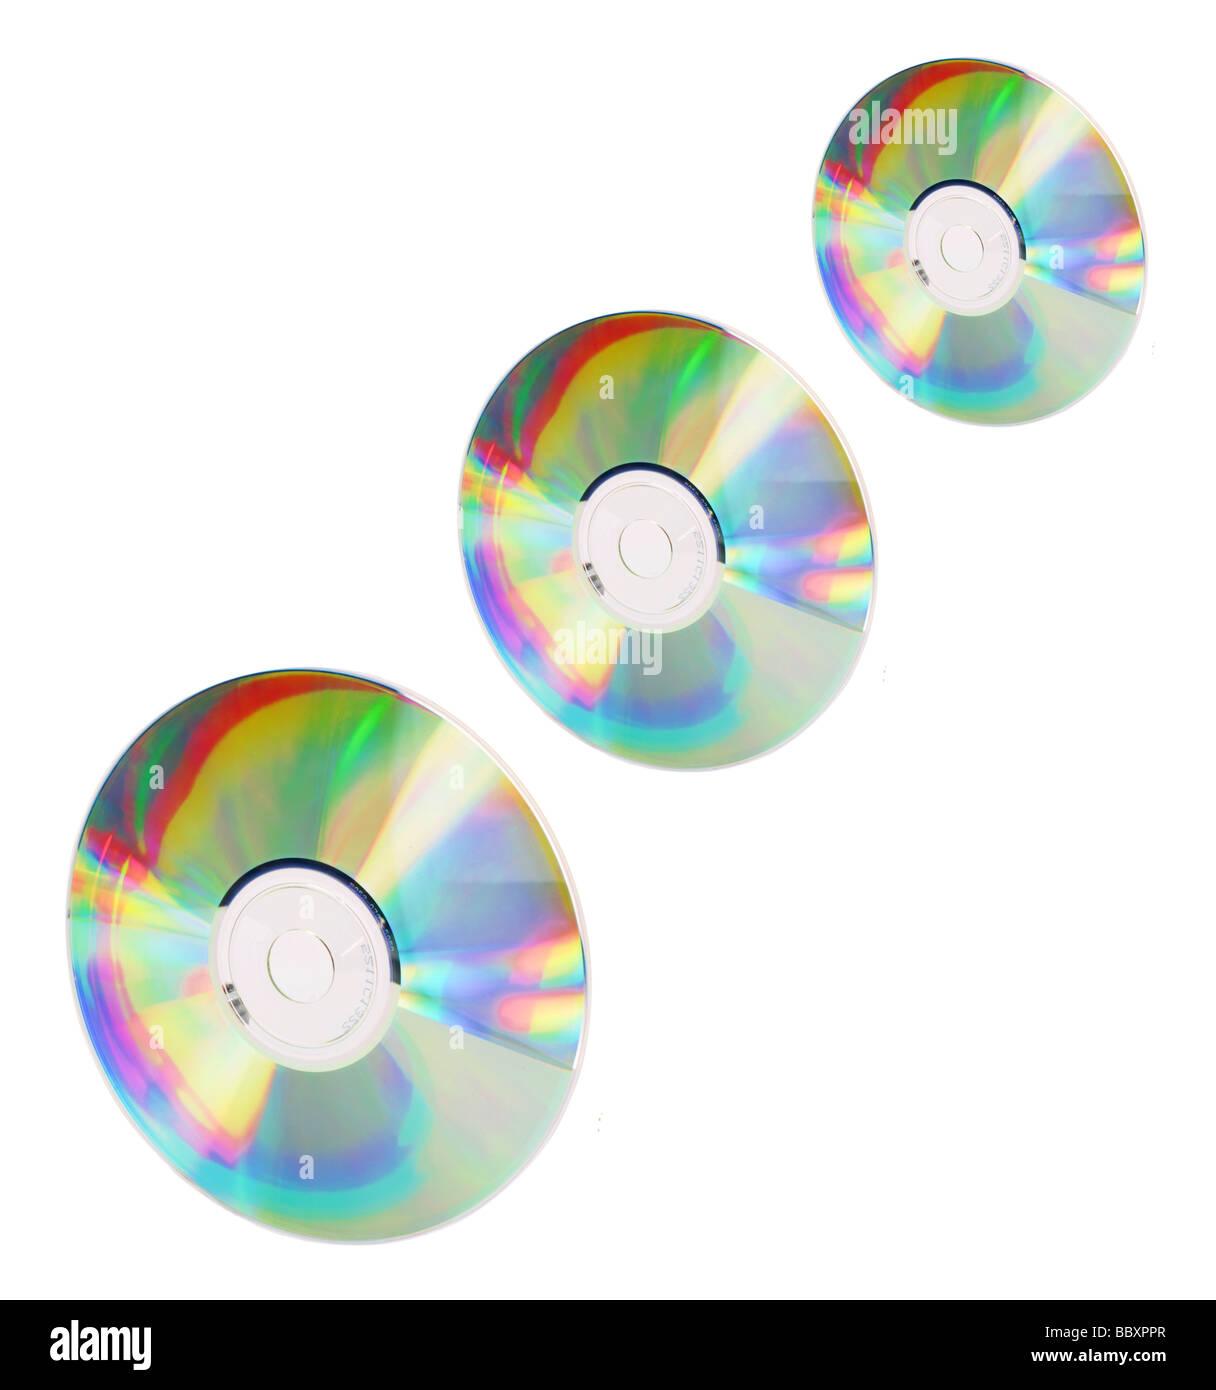 Compact Discs - Stock Image